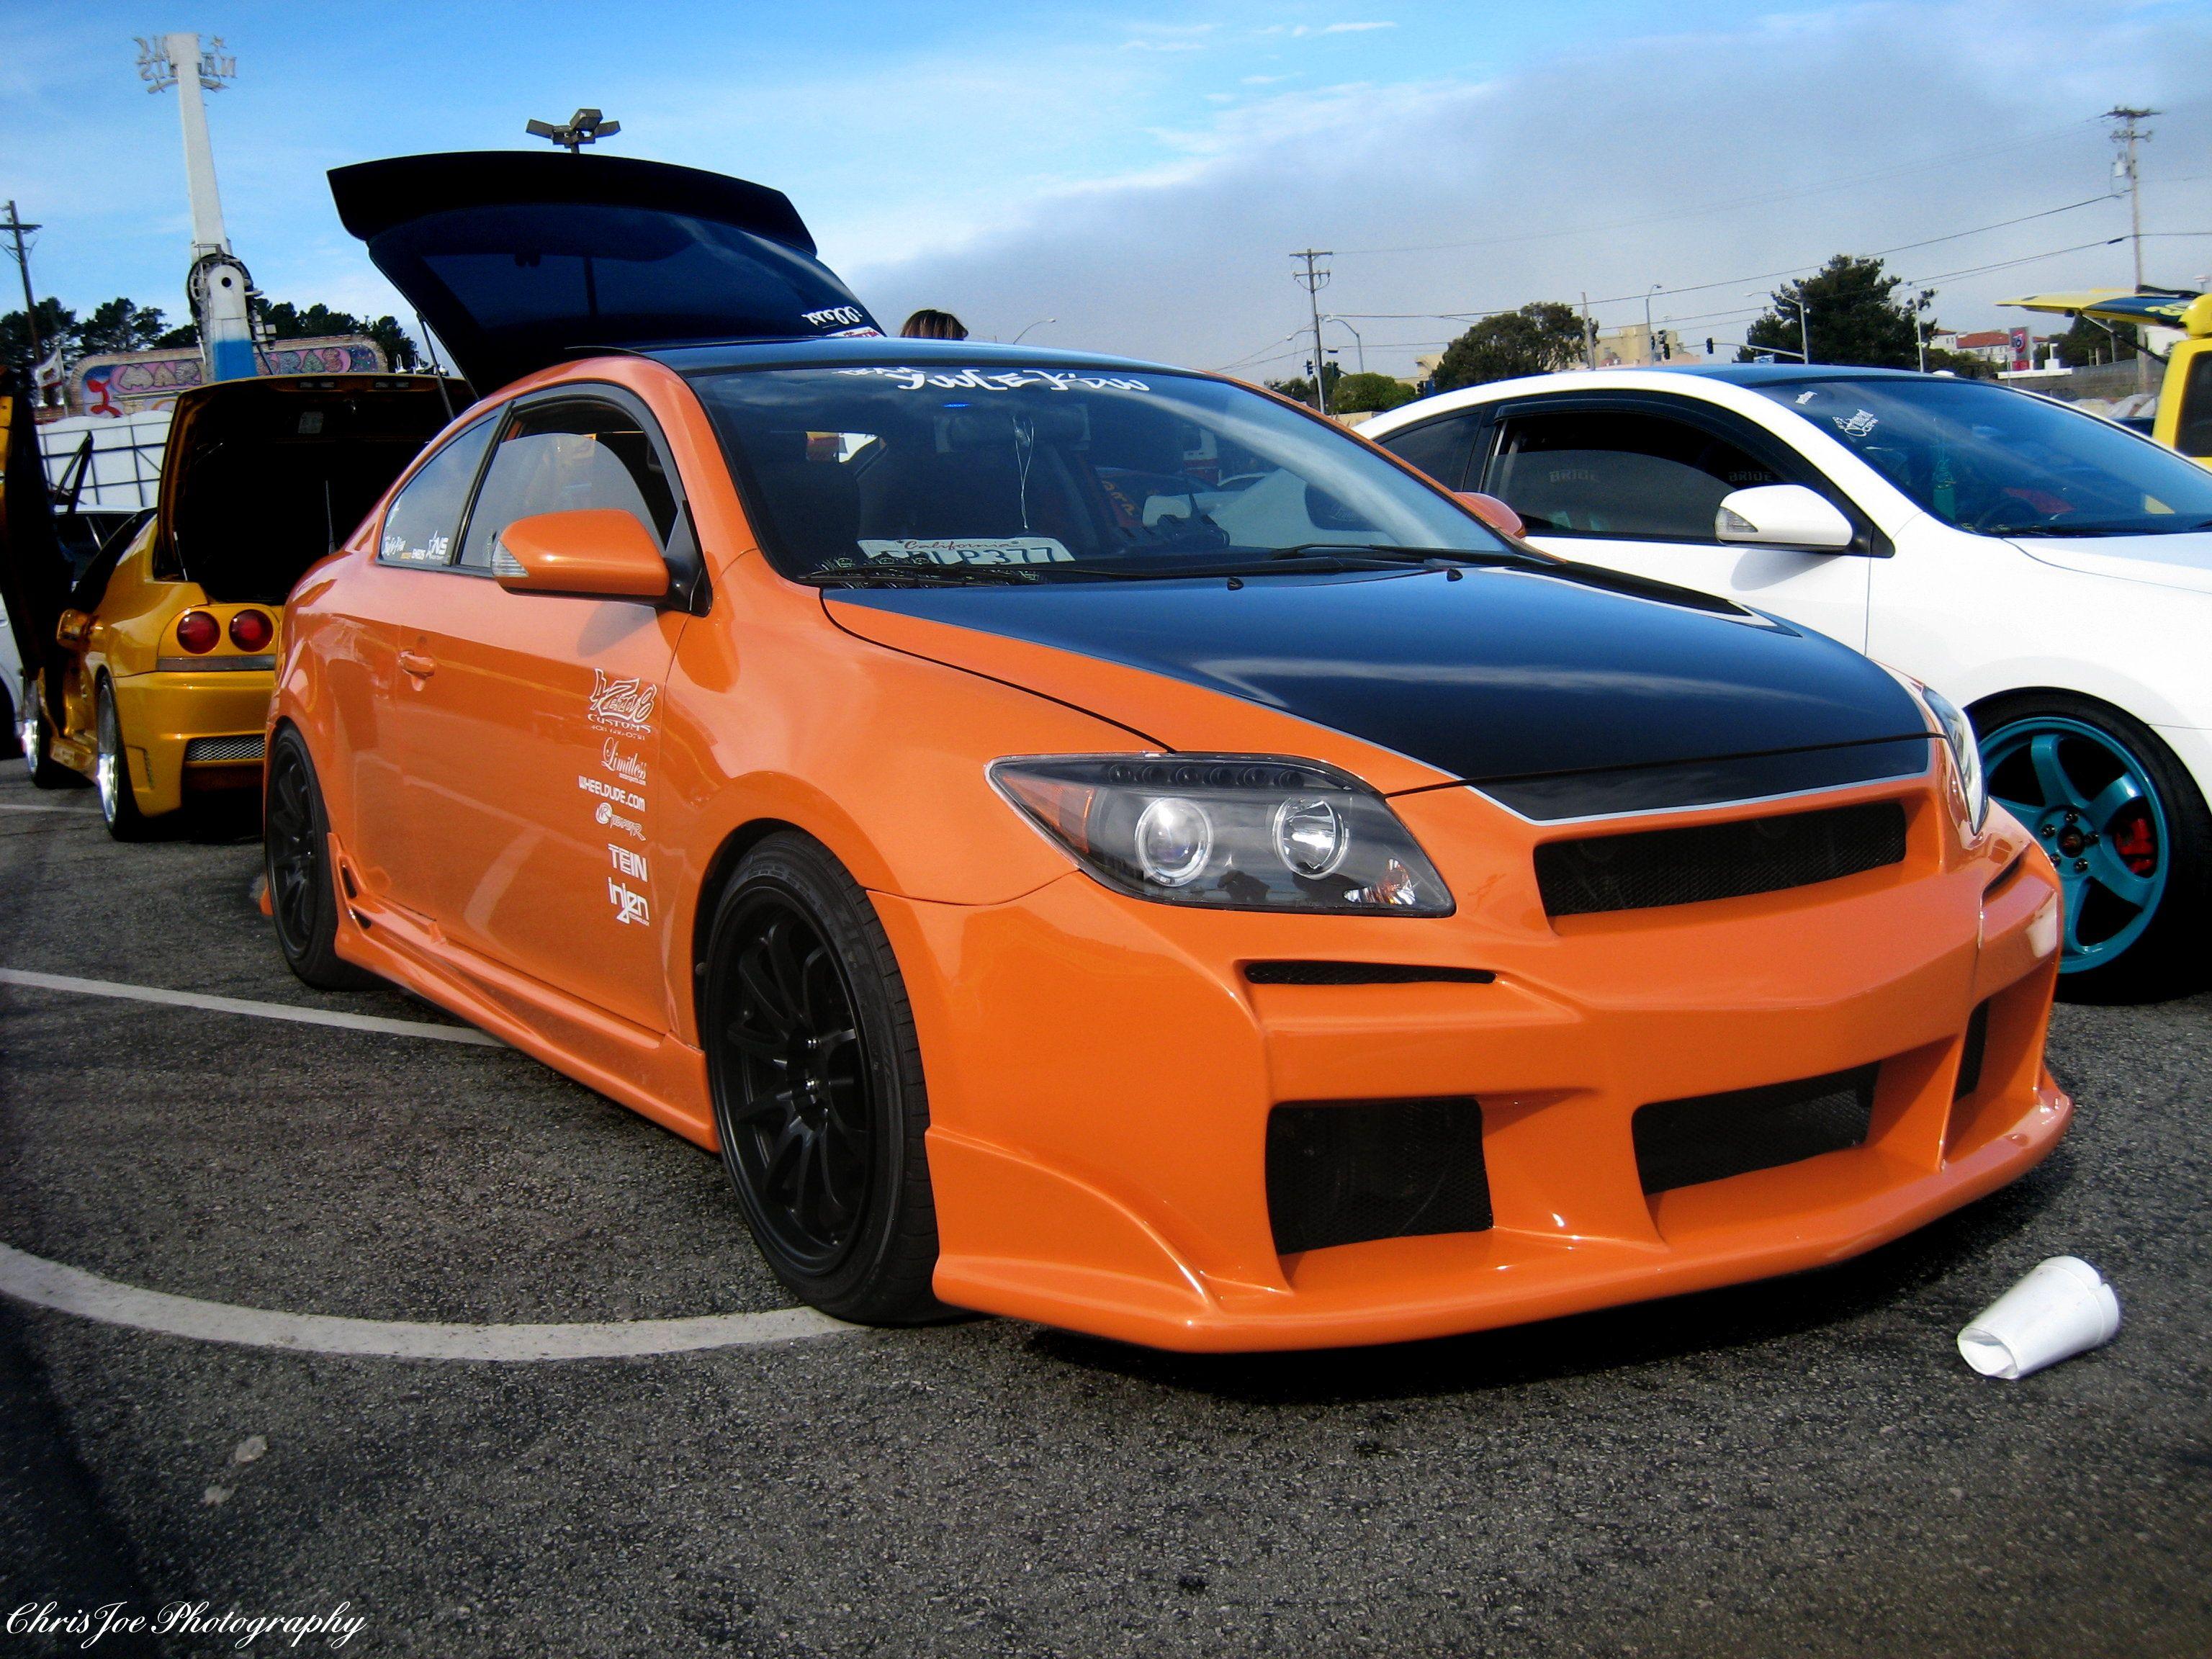 custom Scion tC in orange with black hood and wheels